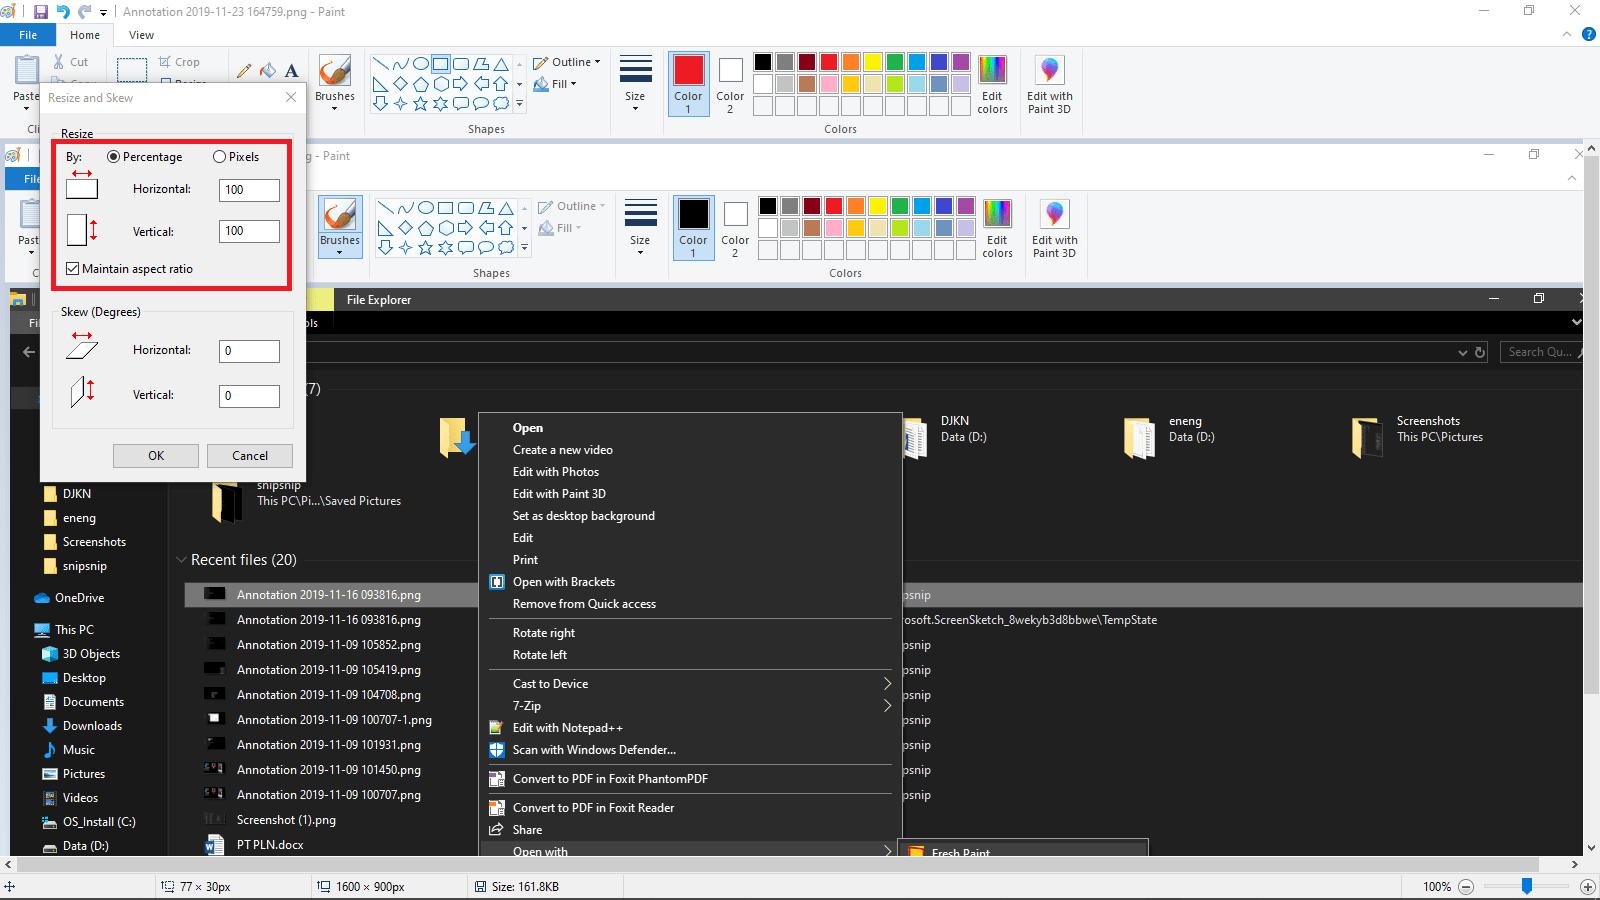 Mengecilkan Ukuran Gambar/Foto di Windows 10